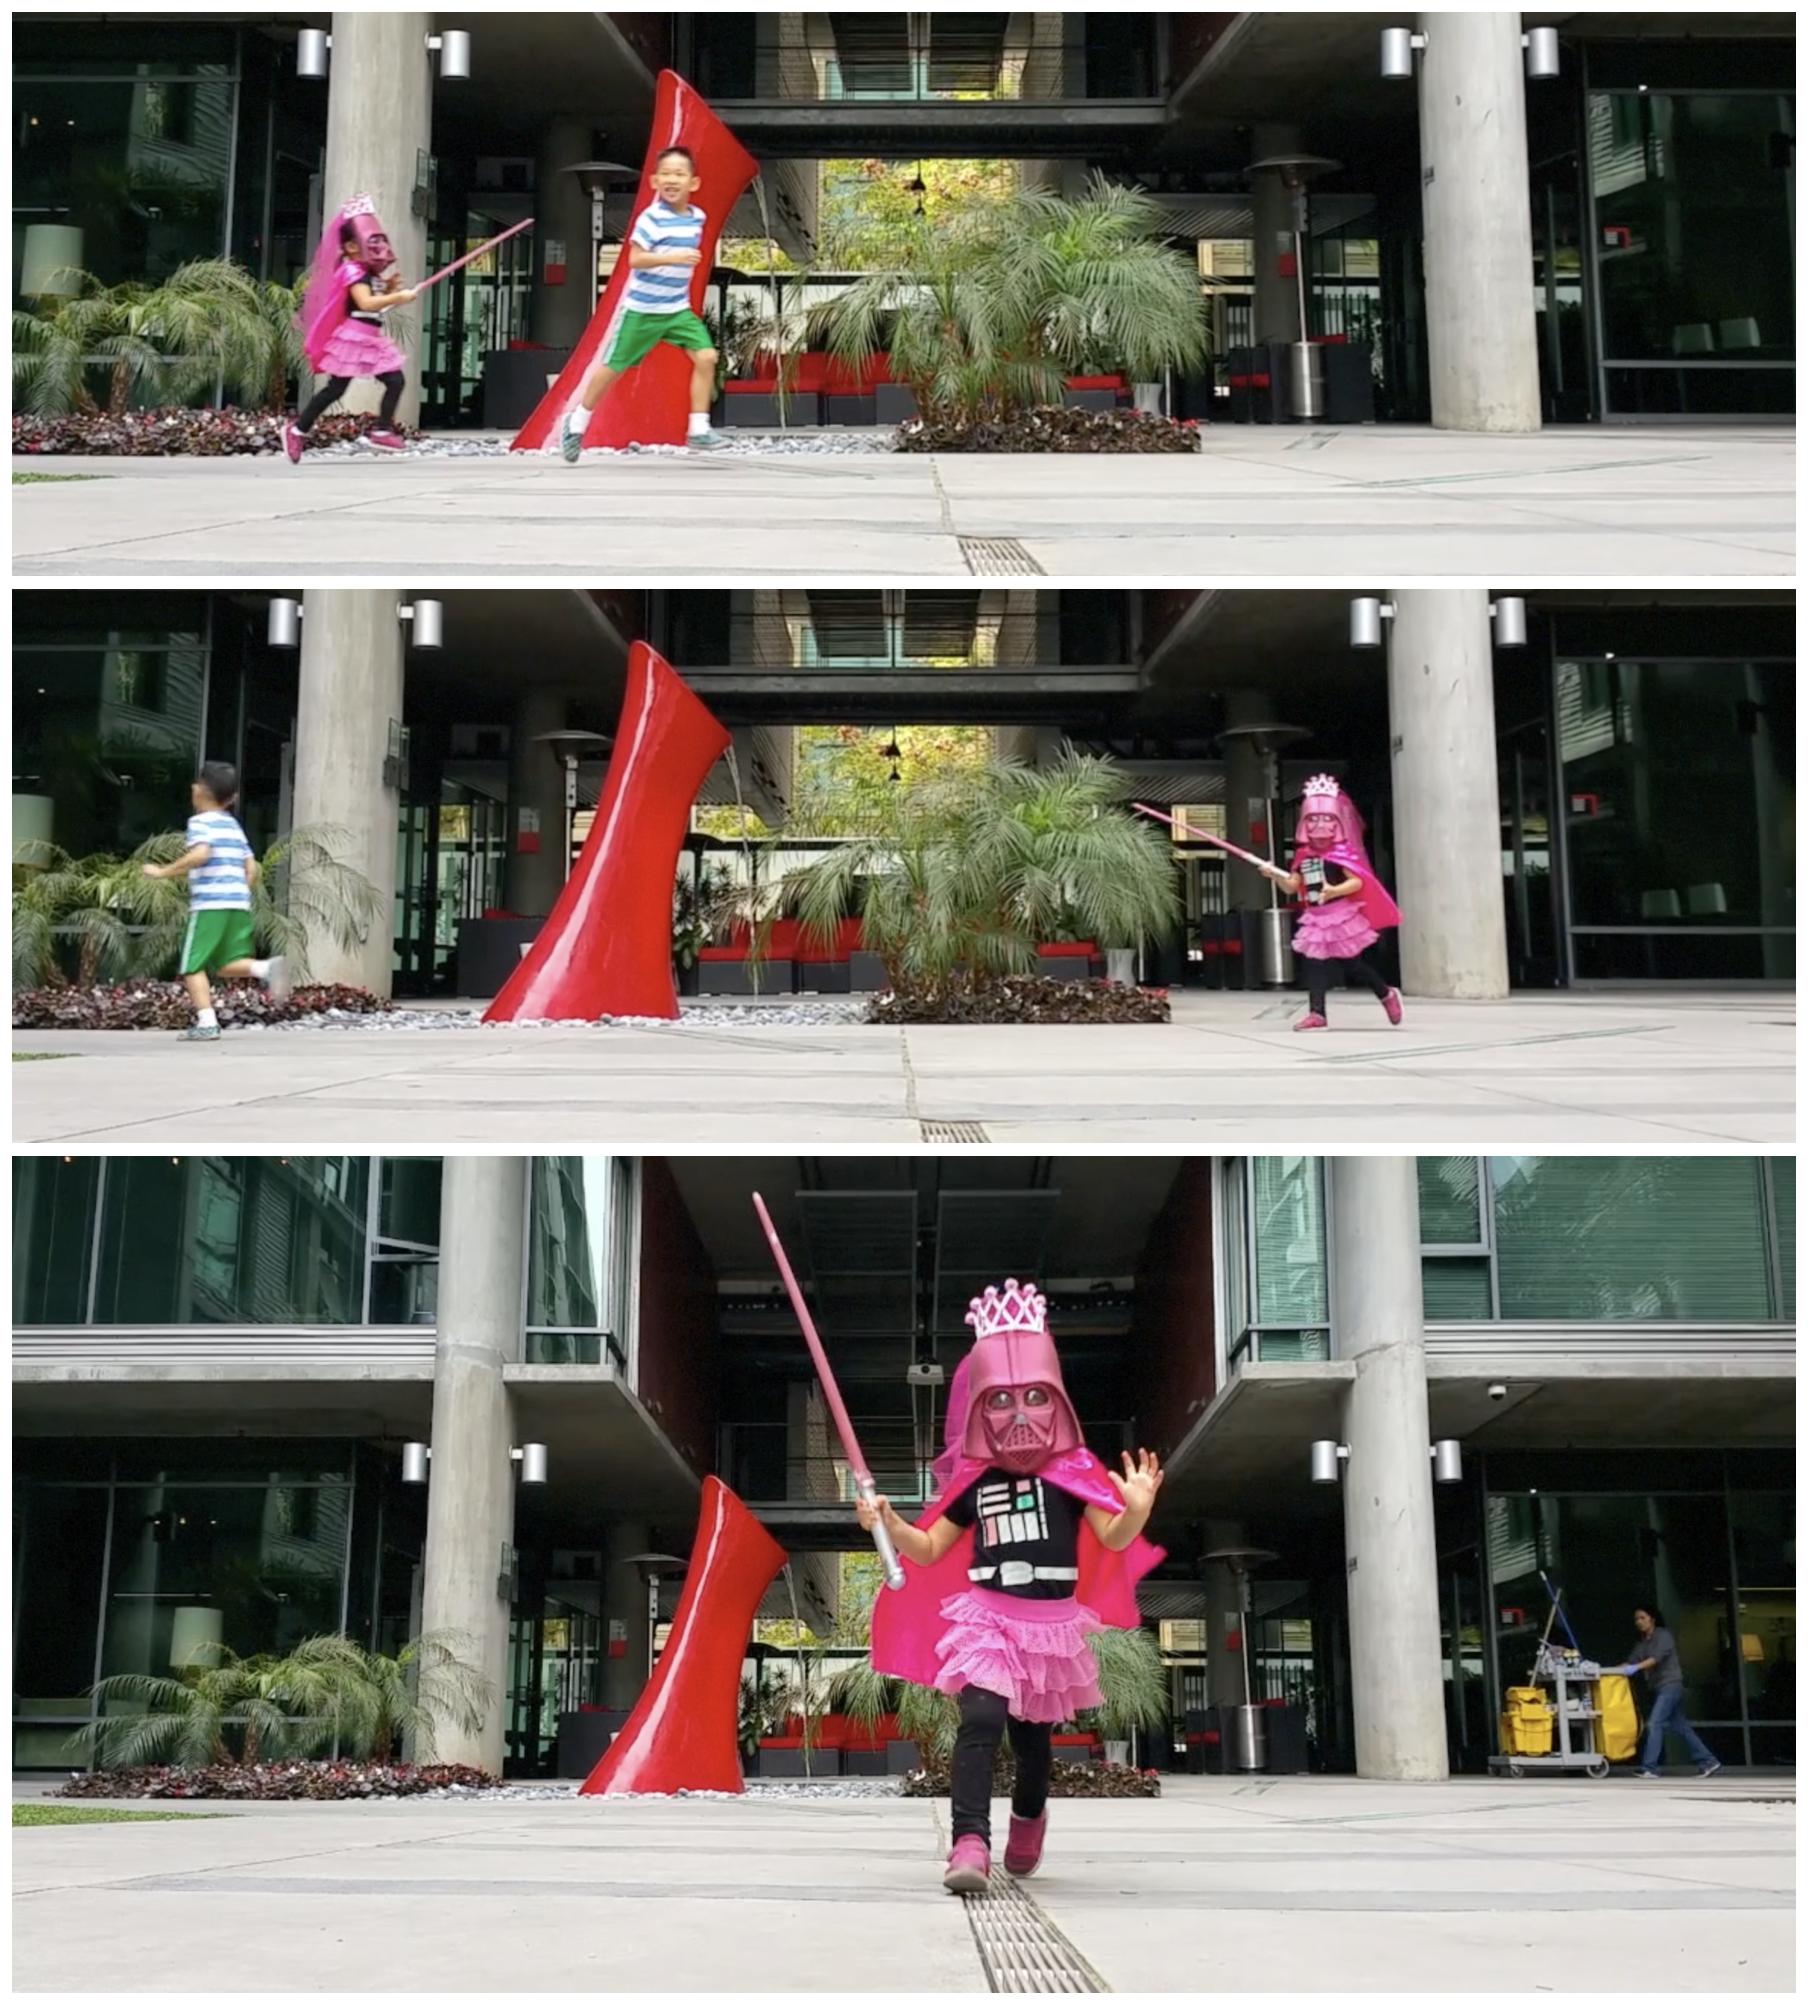 star wars pink darth vader costume toddler kid fun cosplay